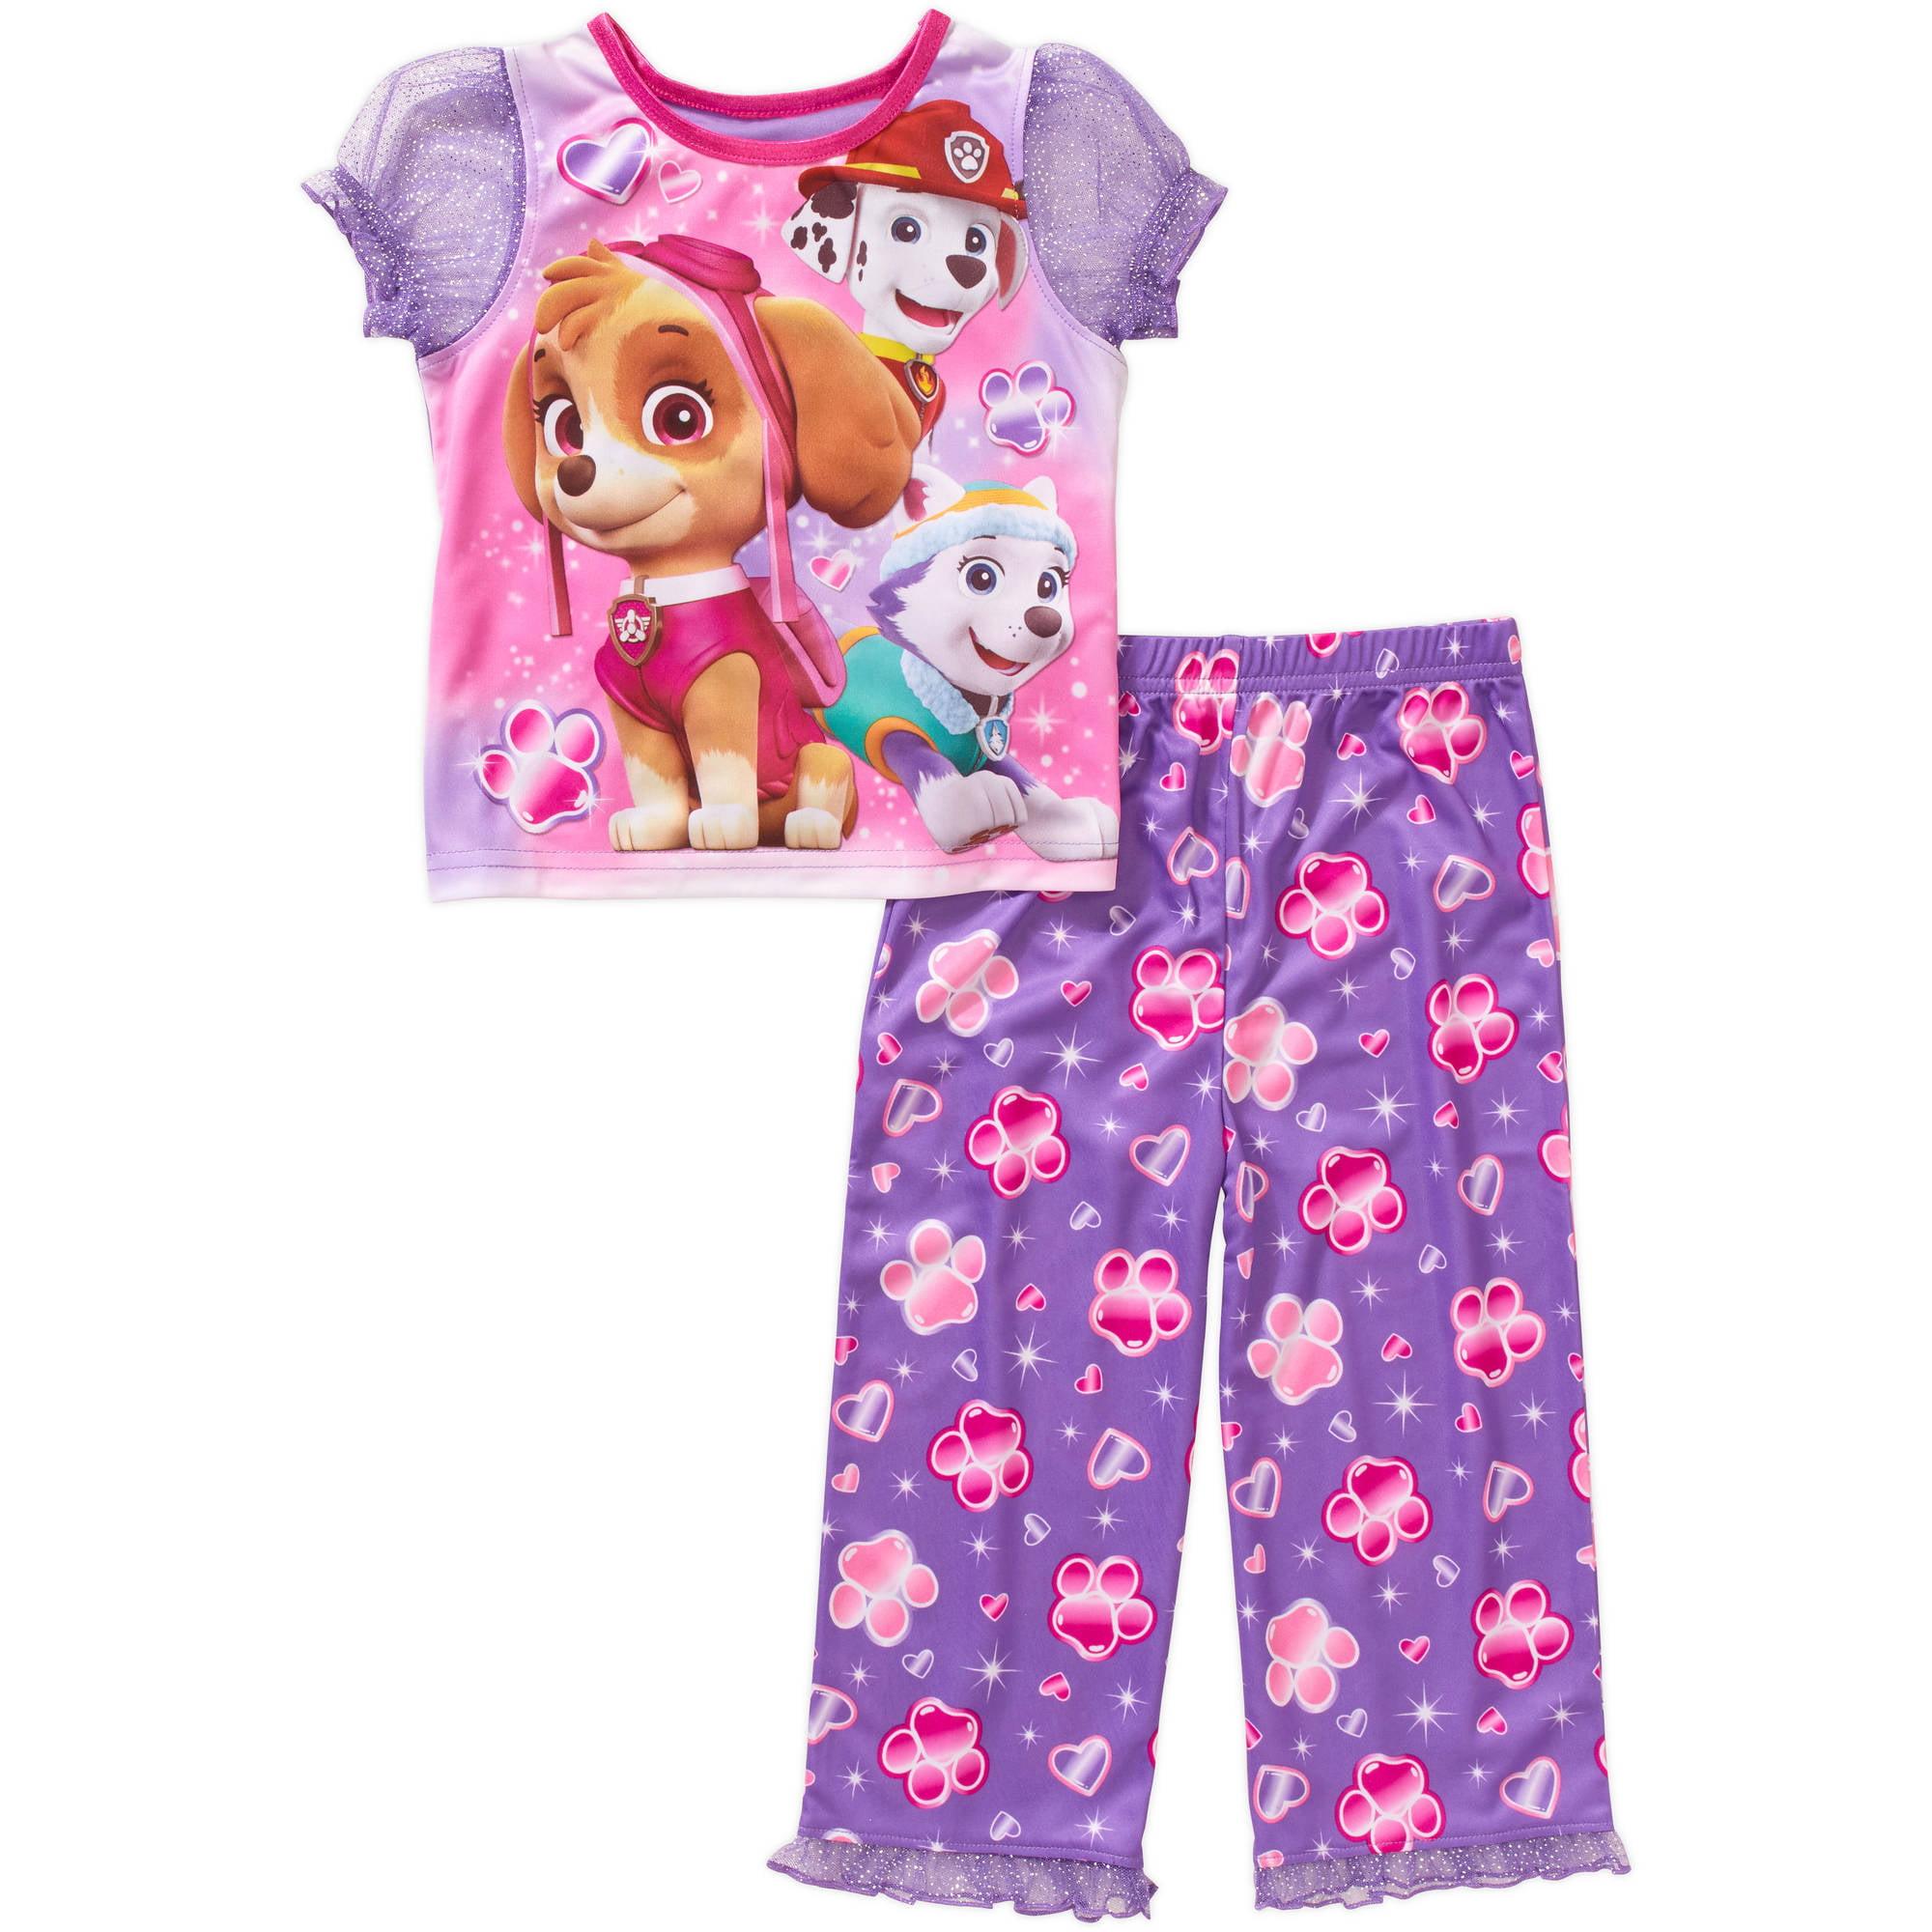 Toddler Girl Sleepwear-paw Patrol - Walmart.com